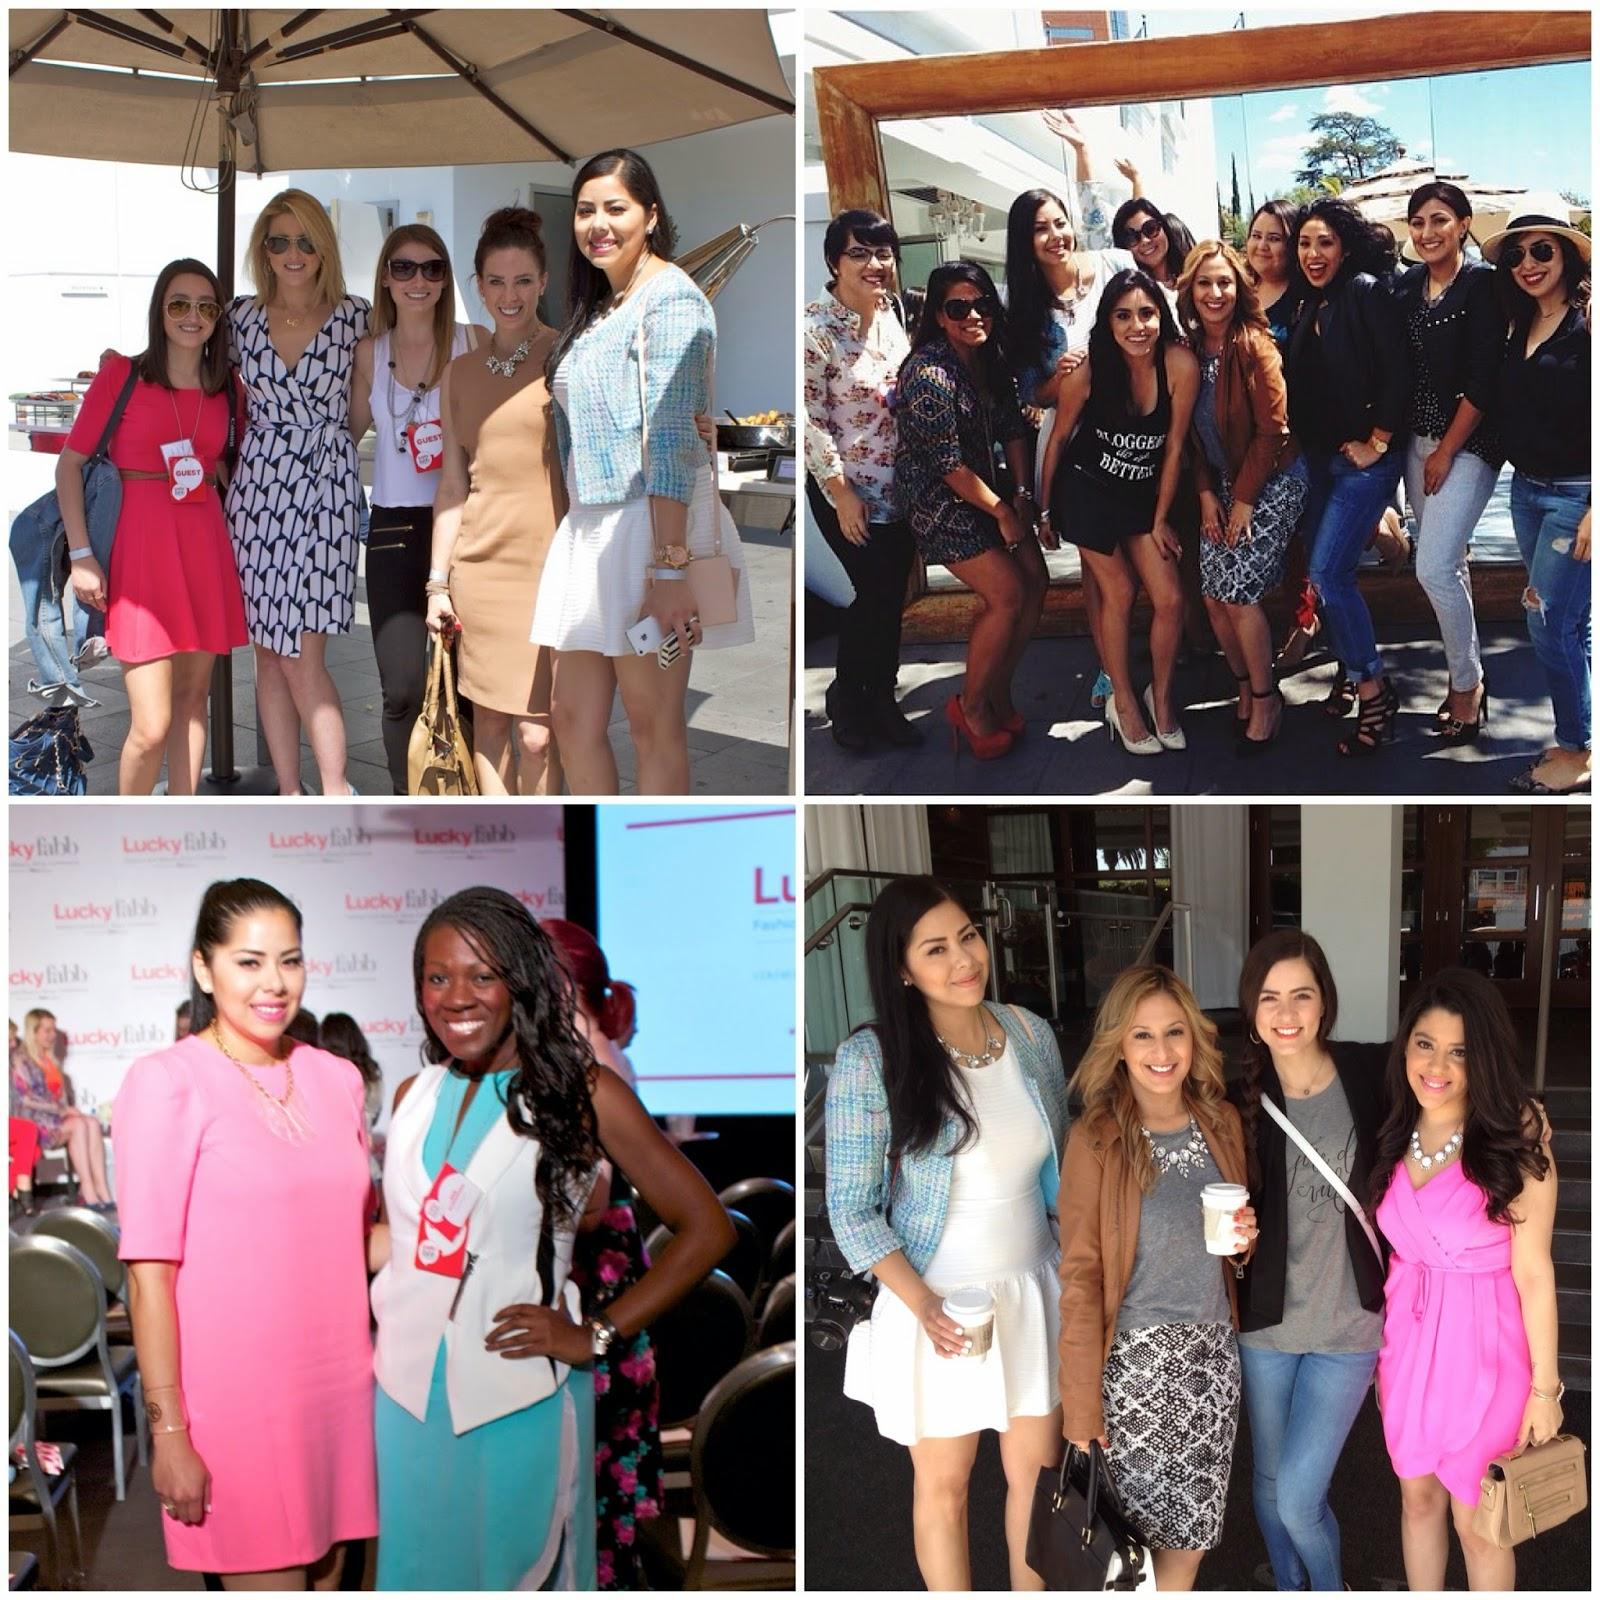 LuckyFabb bloggers mingling